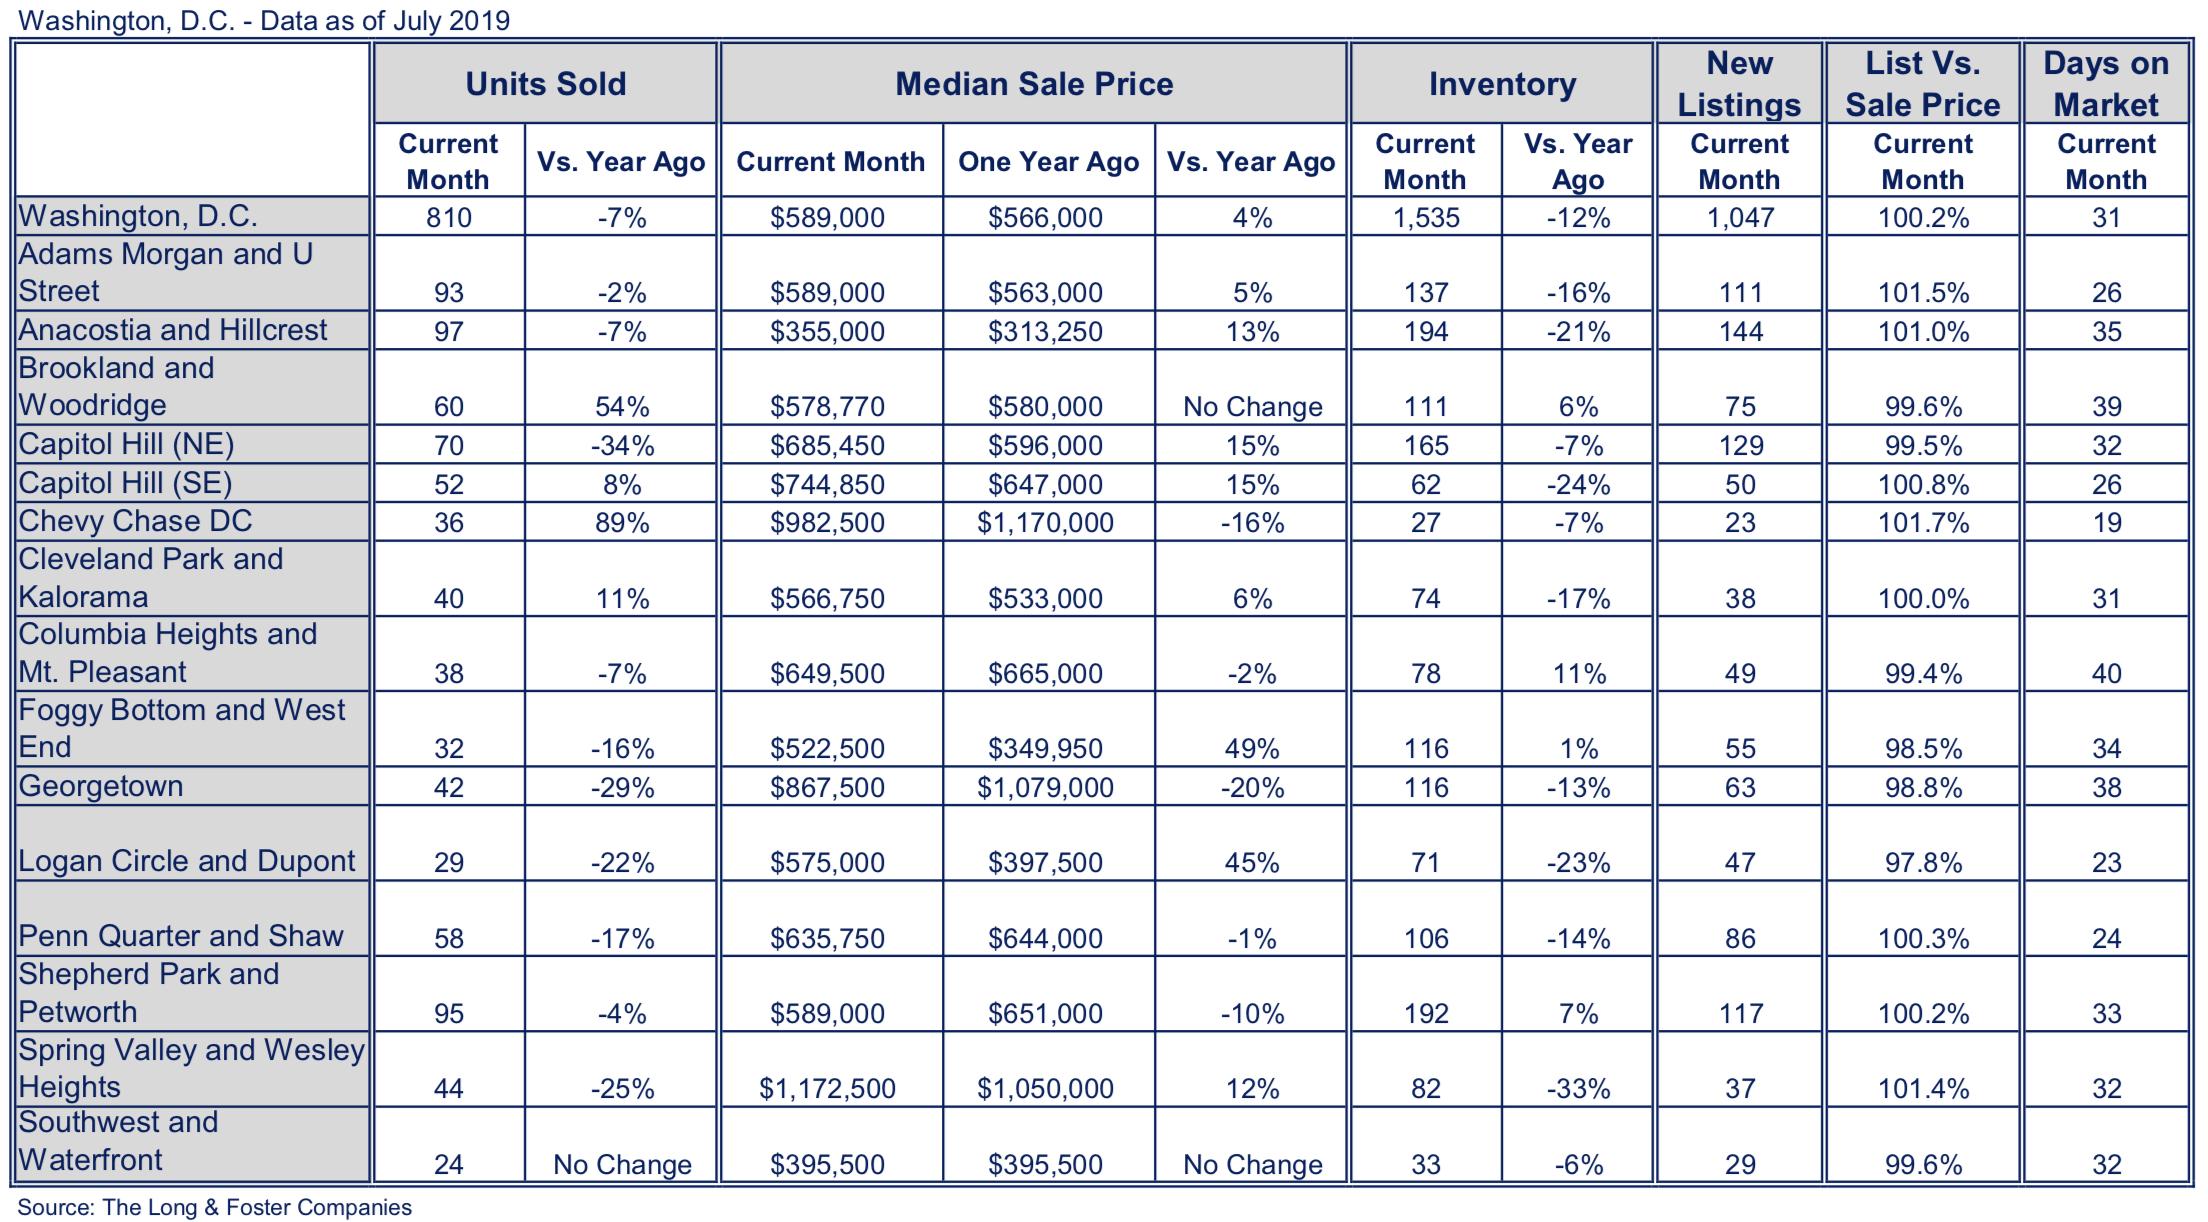 Washington, D.C. Market Minute Chart July 2019